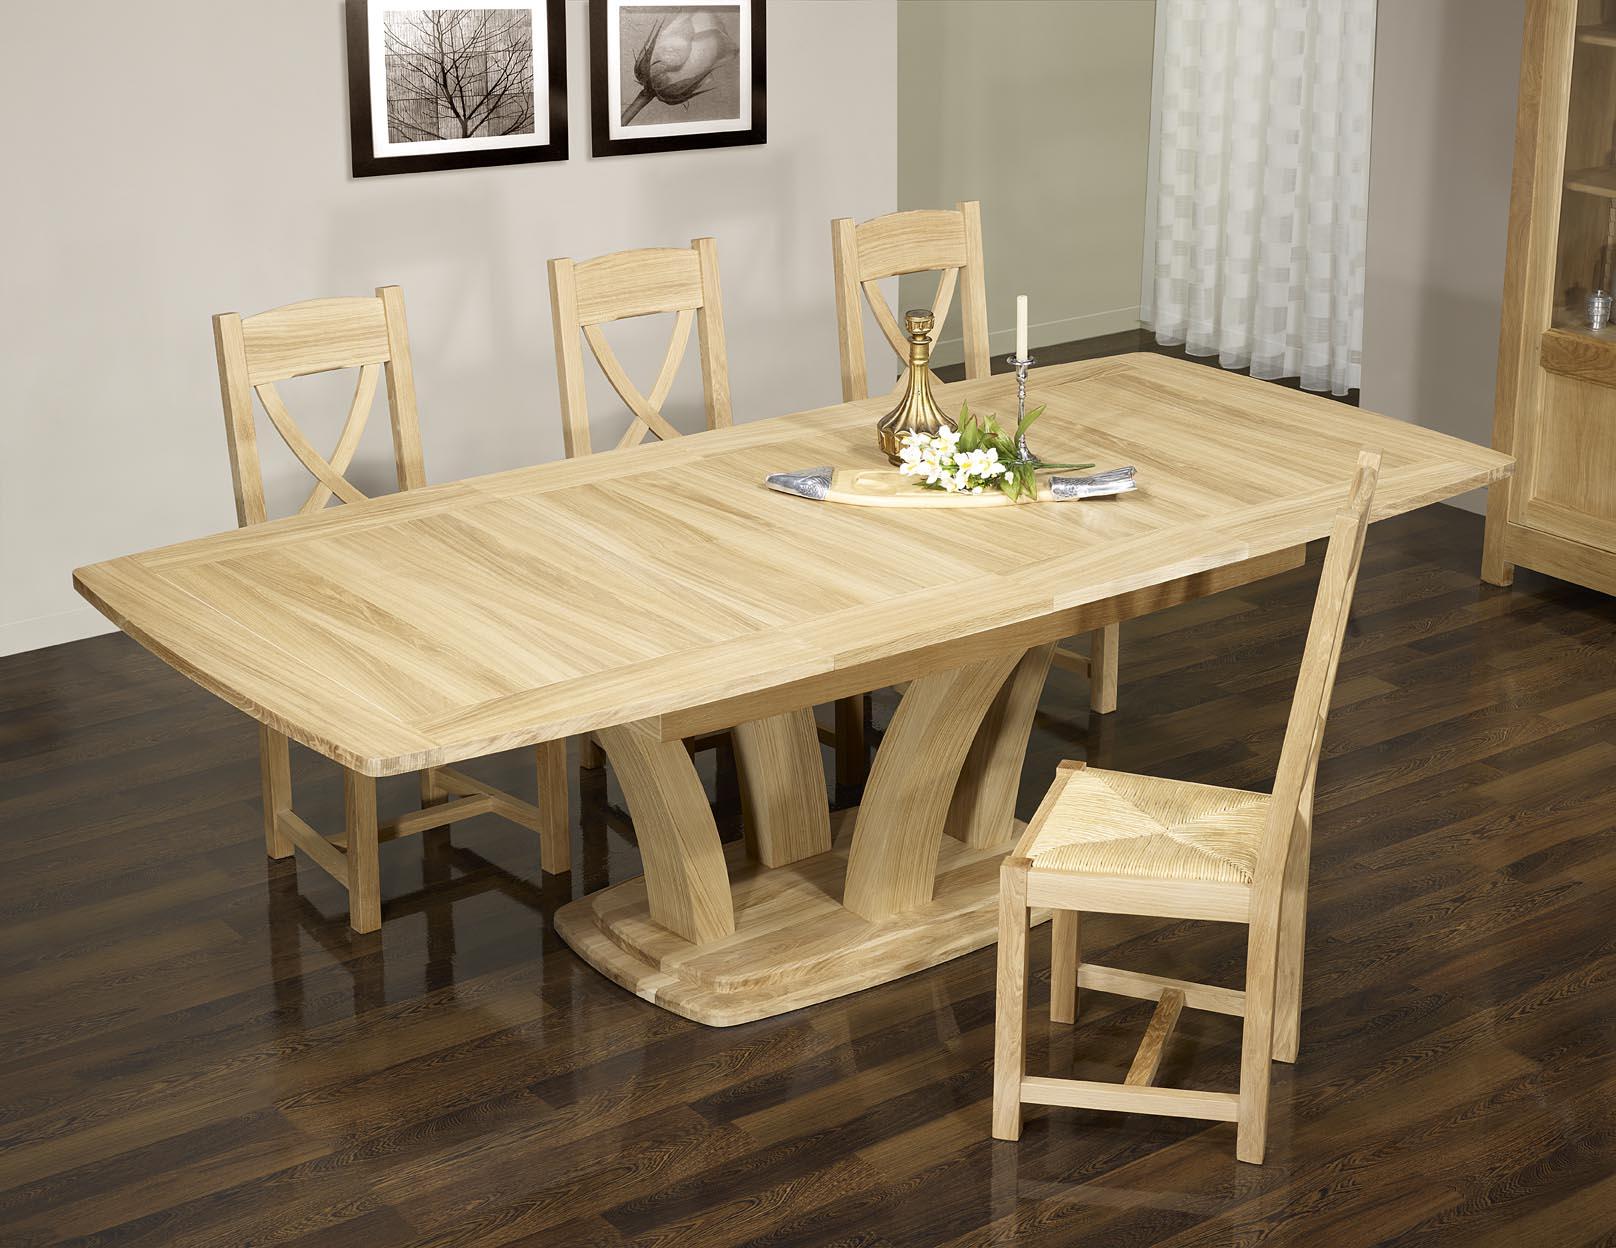 Table Chene Massif Moderne.Table De Repas Contemporaine Realisee En Chene Massif Finition Chene Naturel Cire